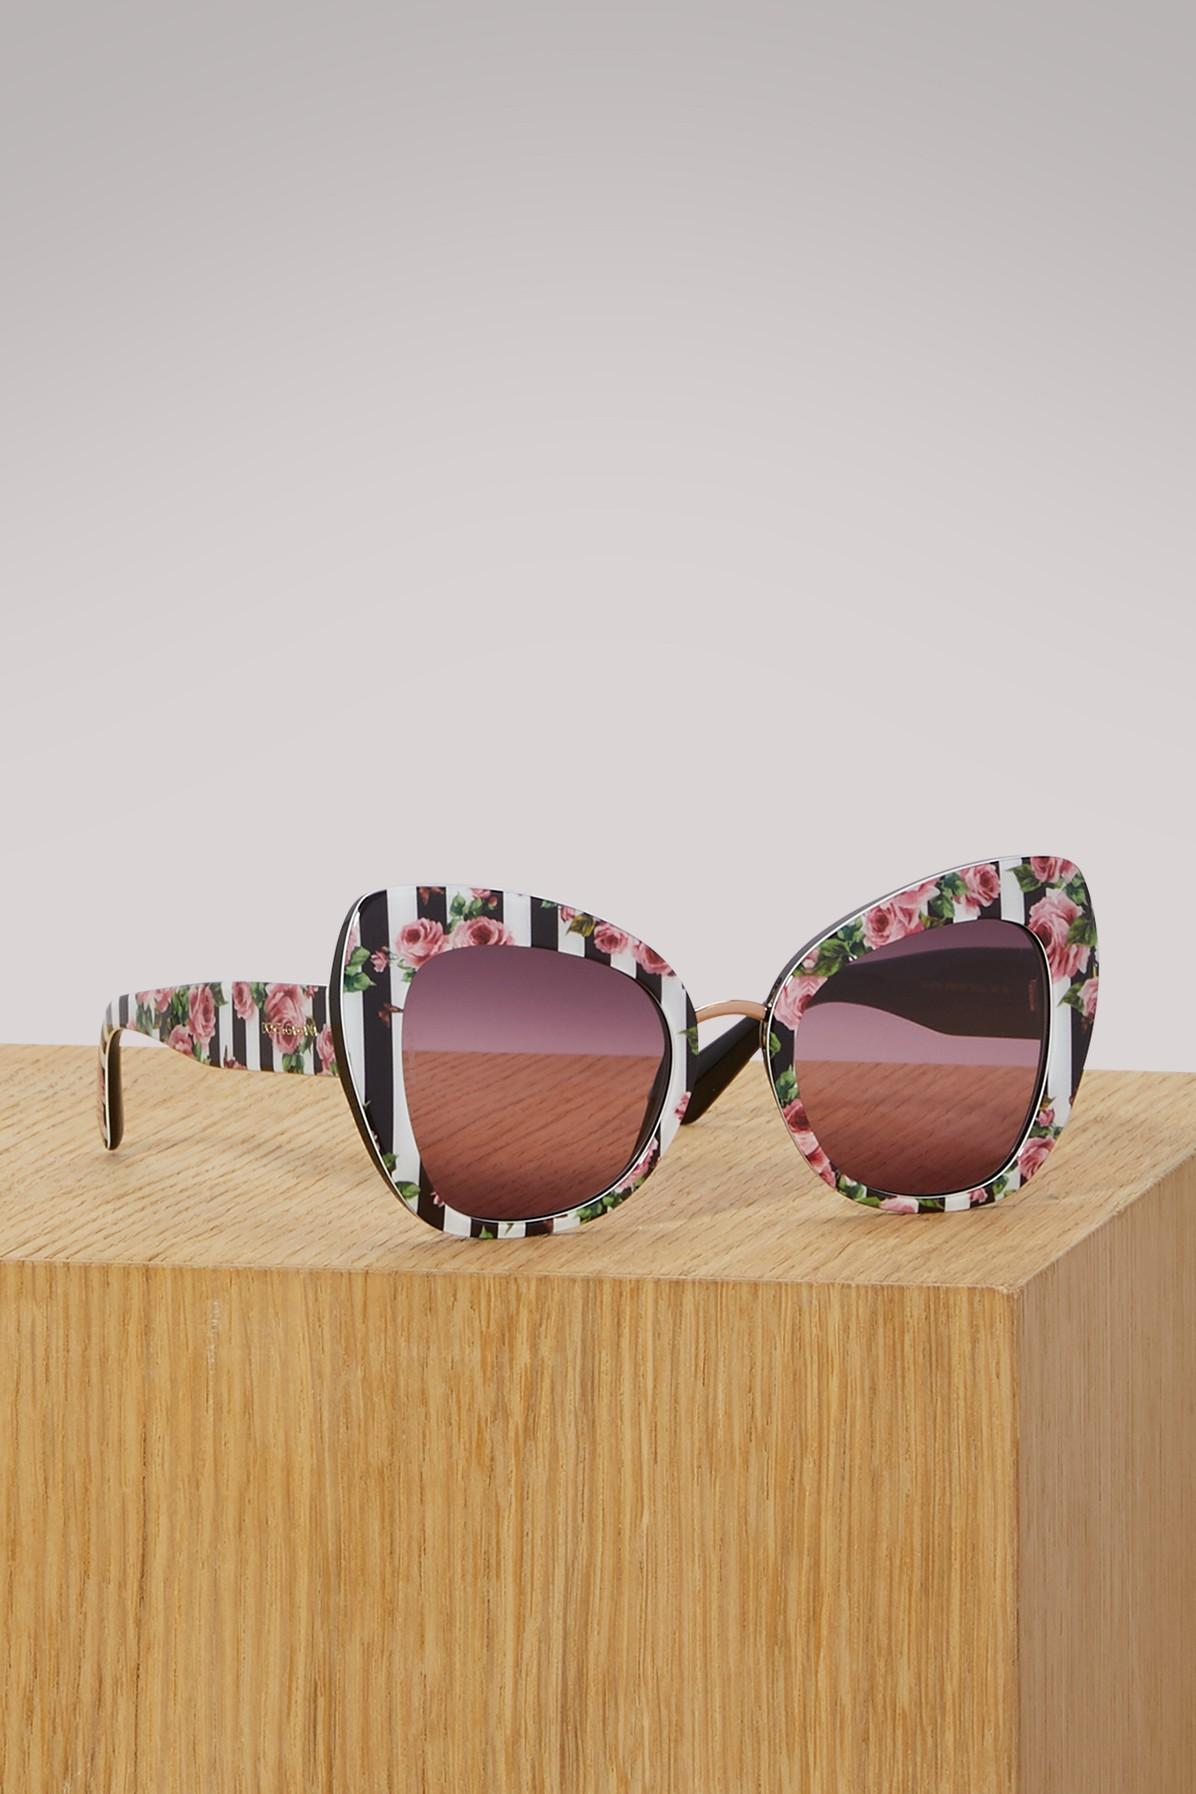 Dolce & Gabbana Graffiti Sunglasses